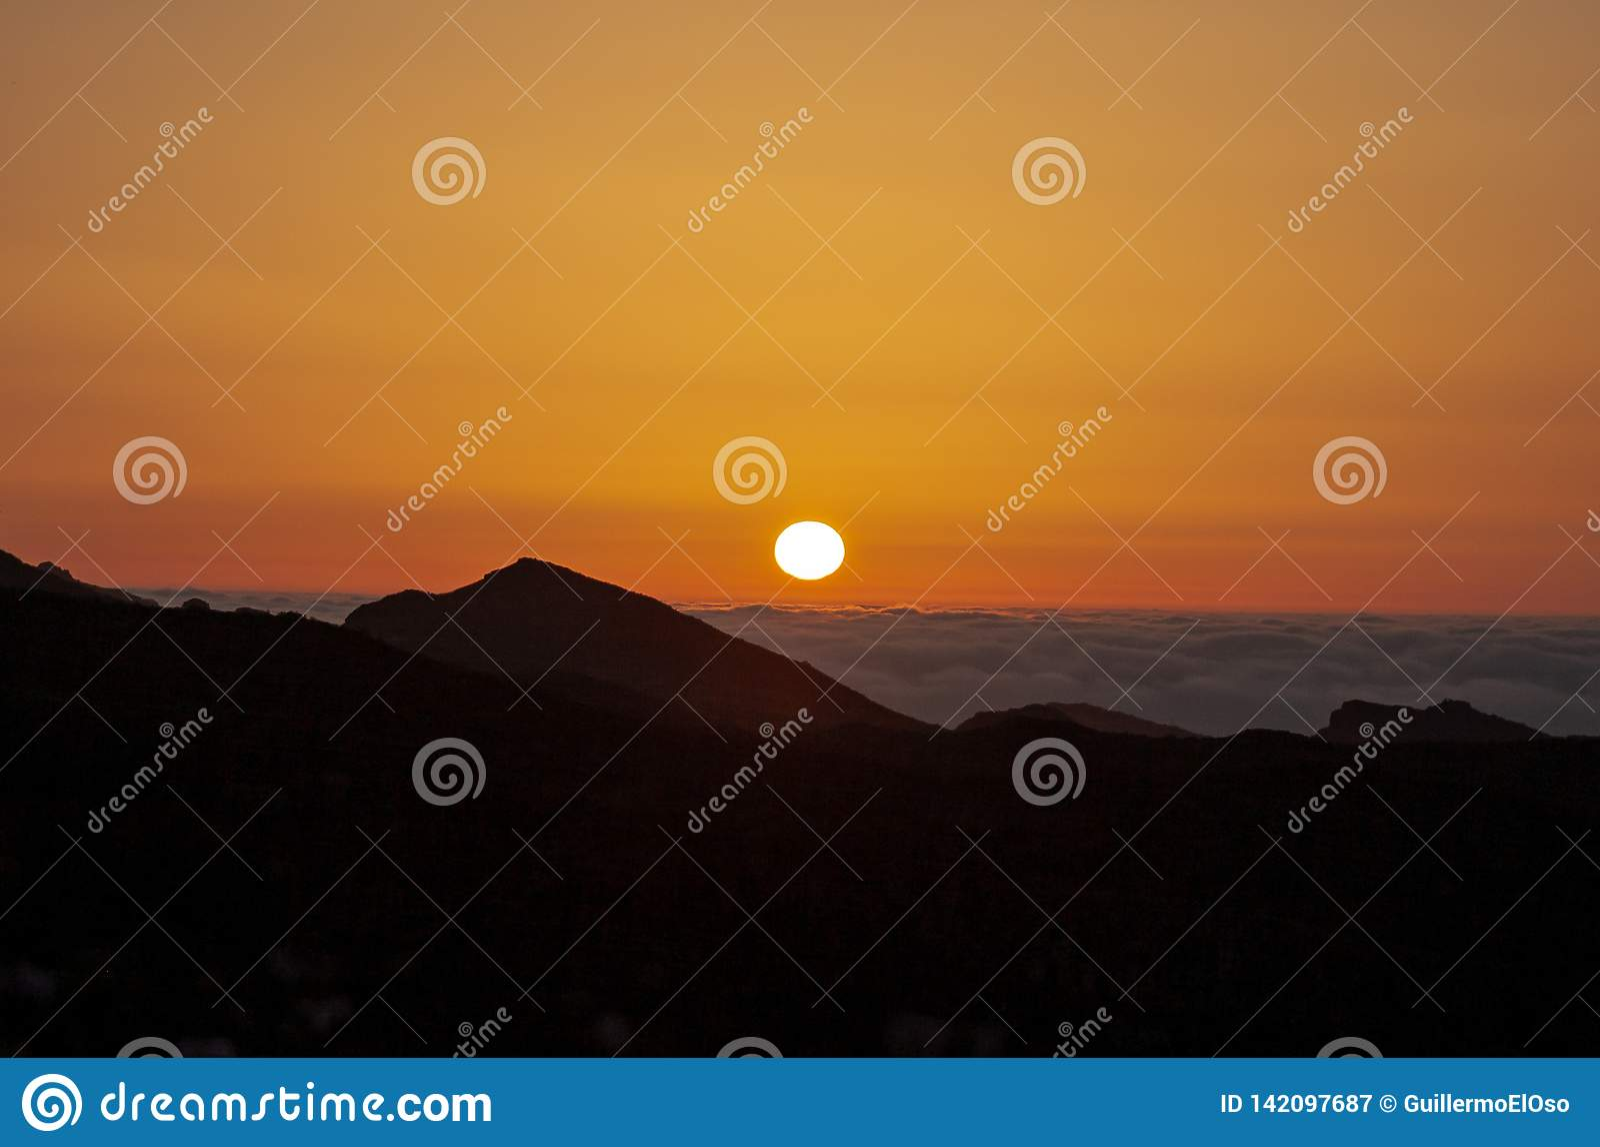 Duży wschód słońca nad morzem z chmurami